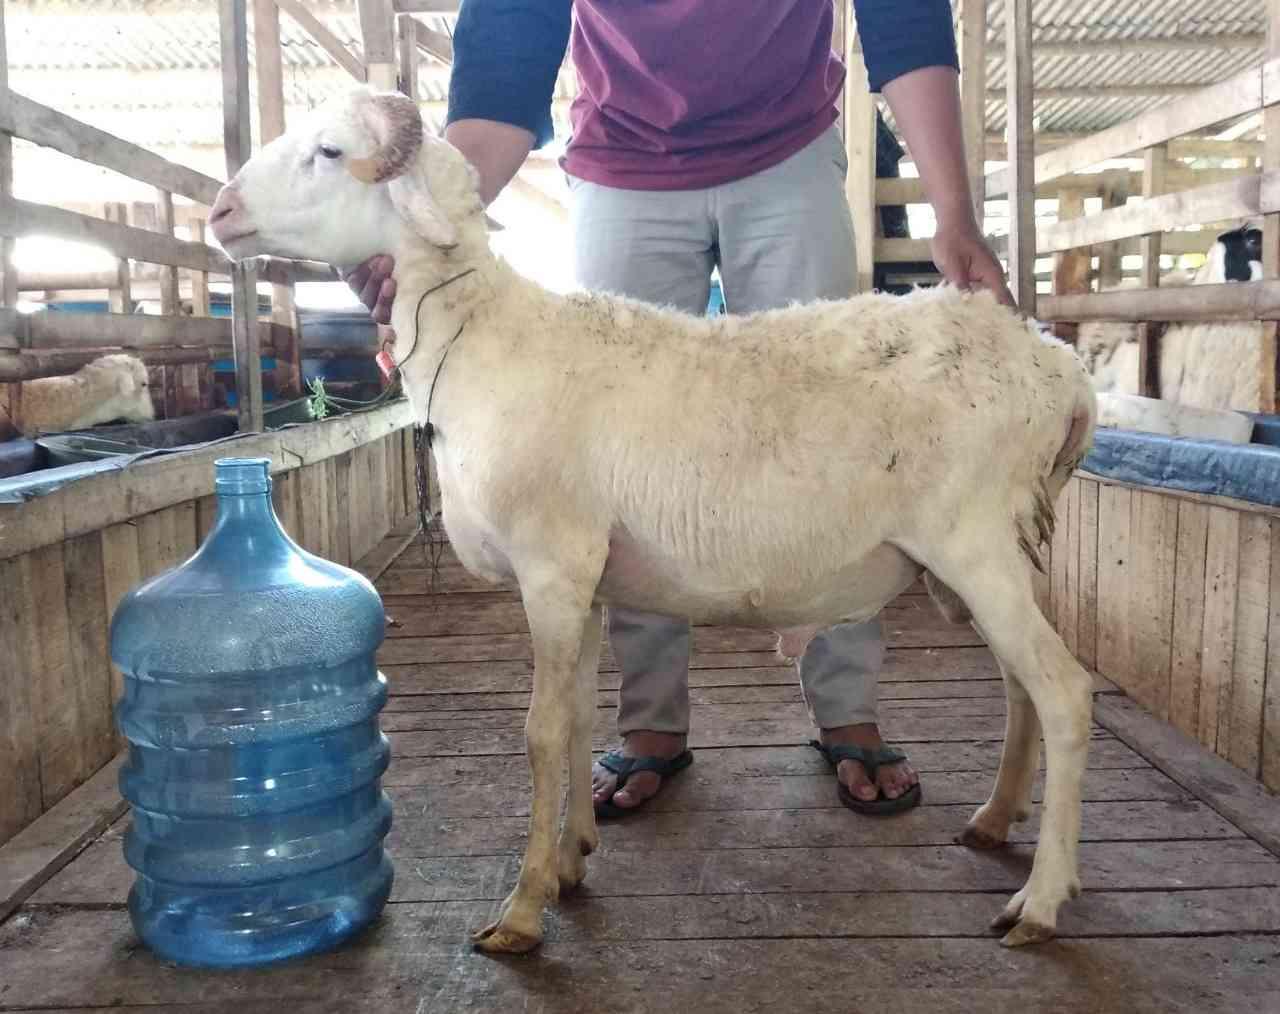 Jual Domba Qurban di Depok bobot 21-25 kg